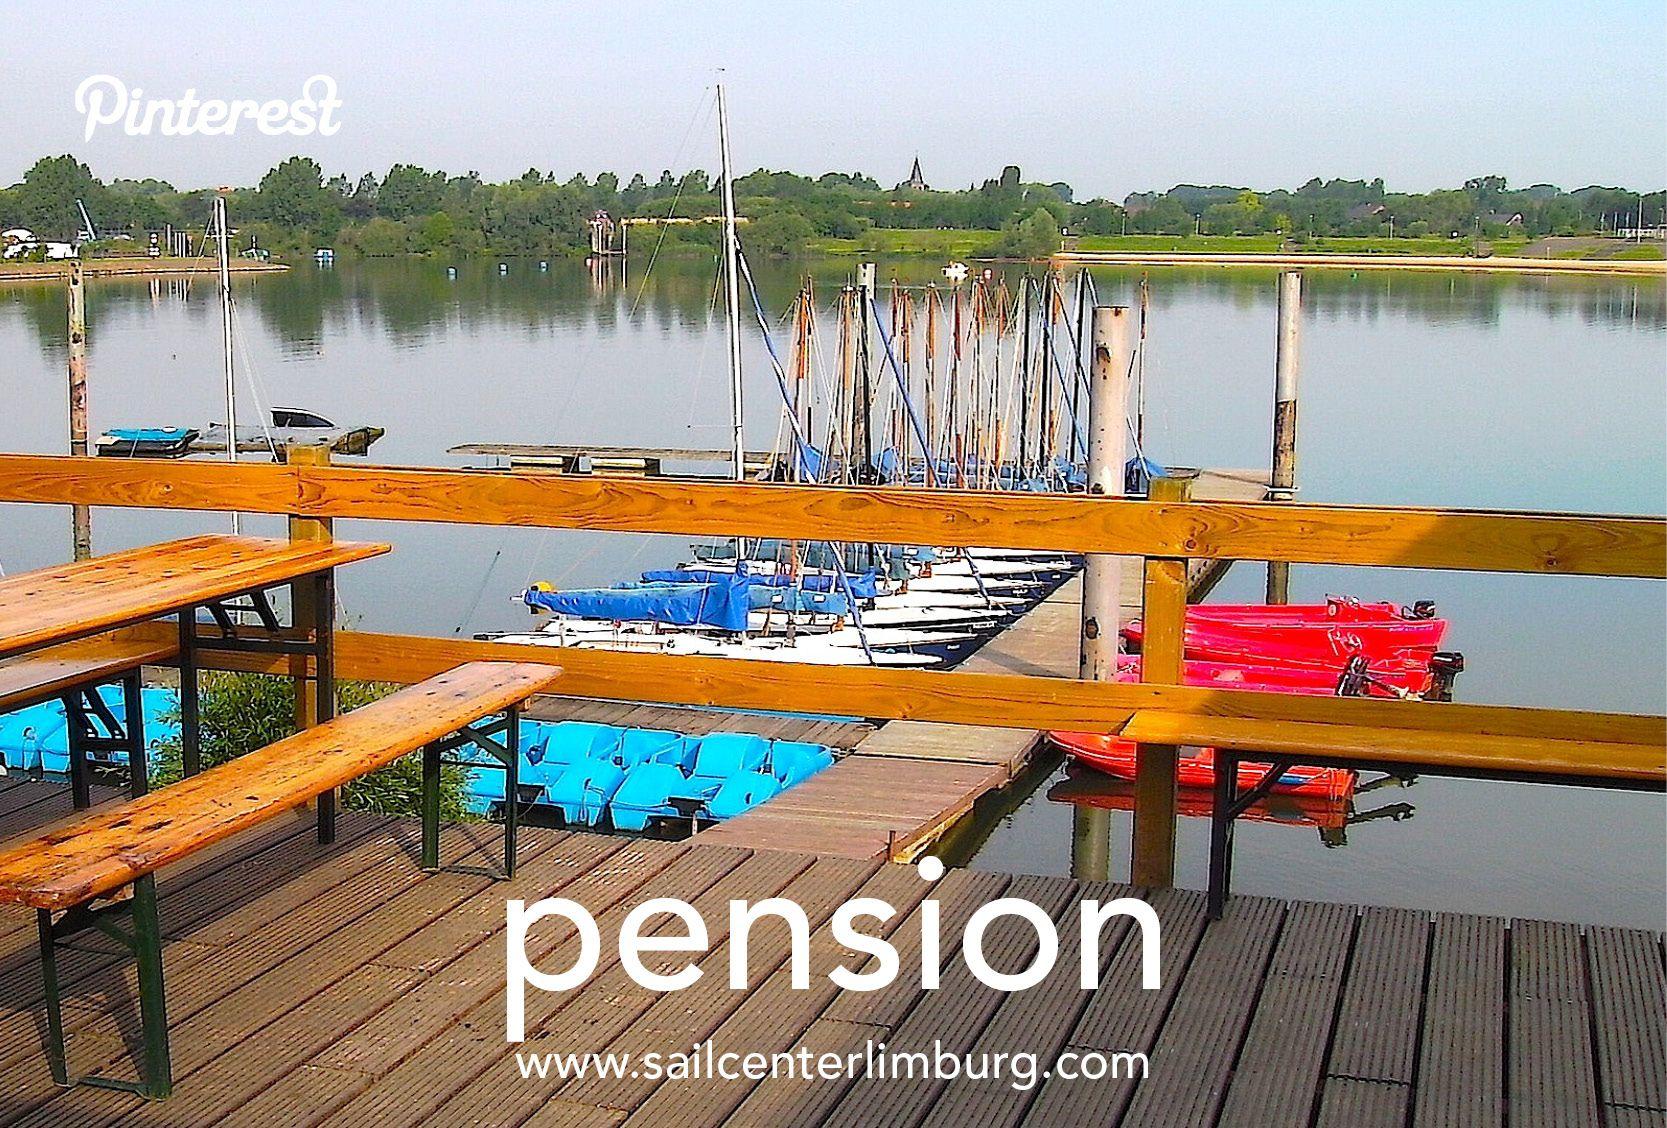 www.sailcenterlimburg.com